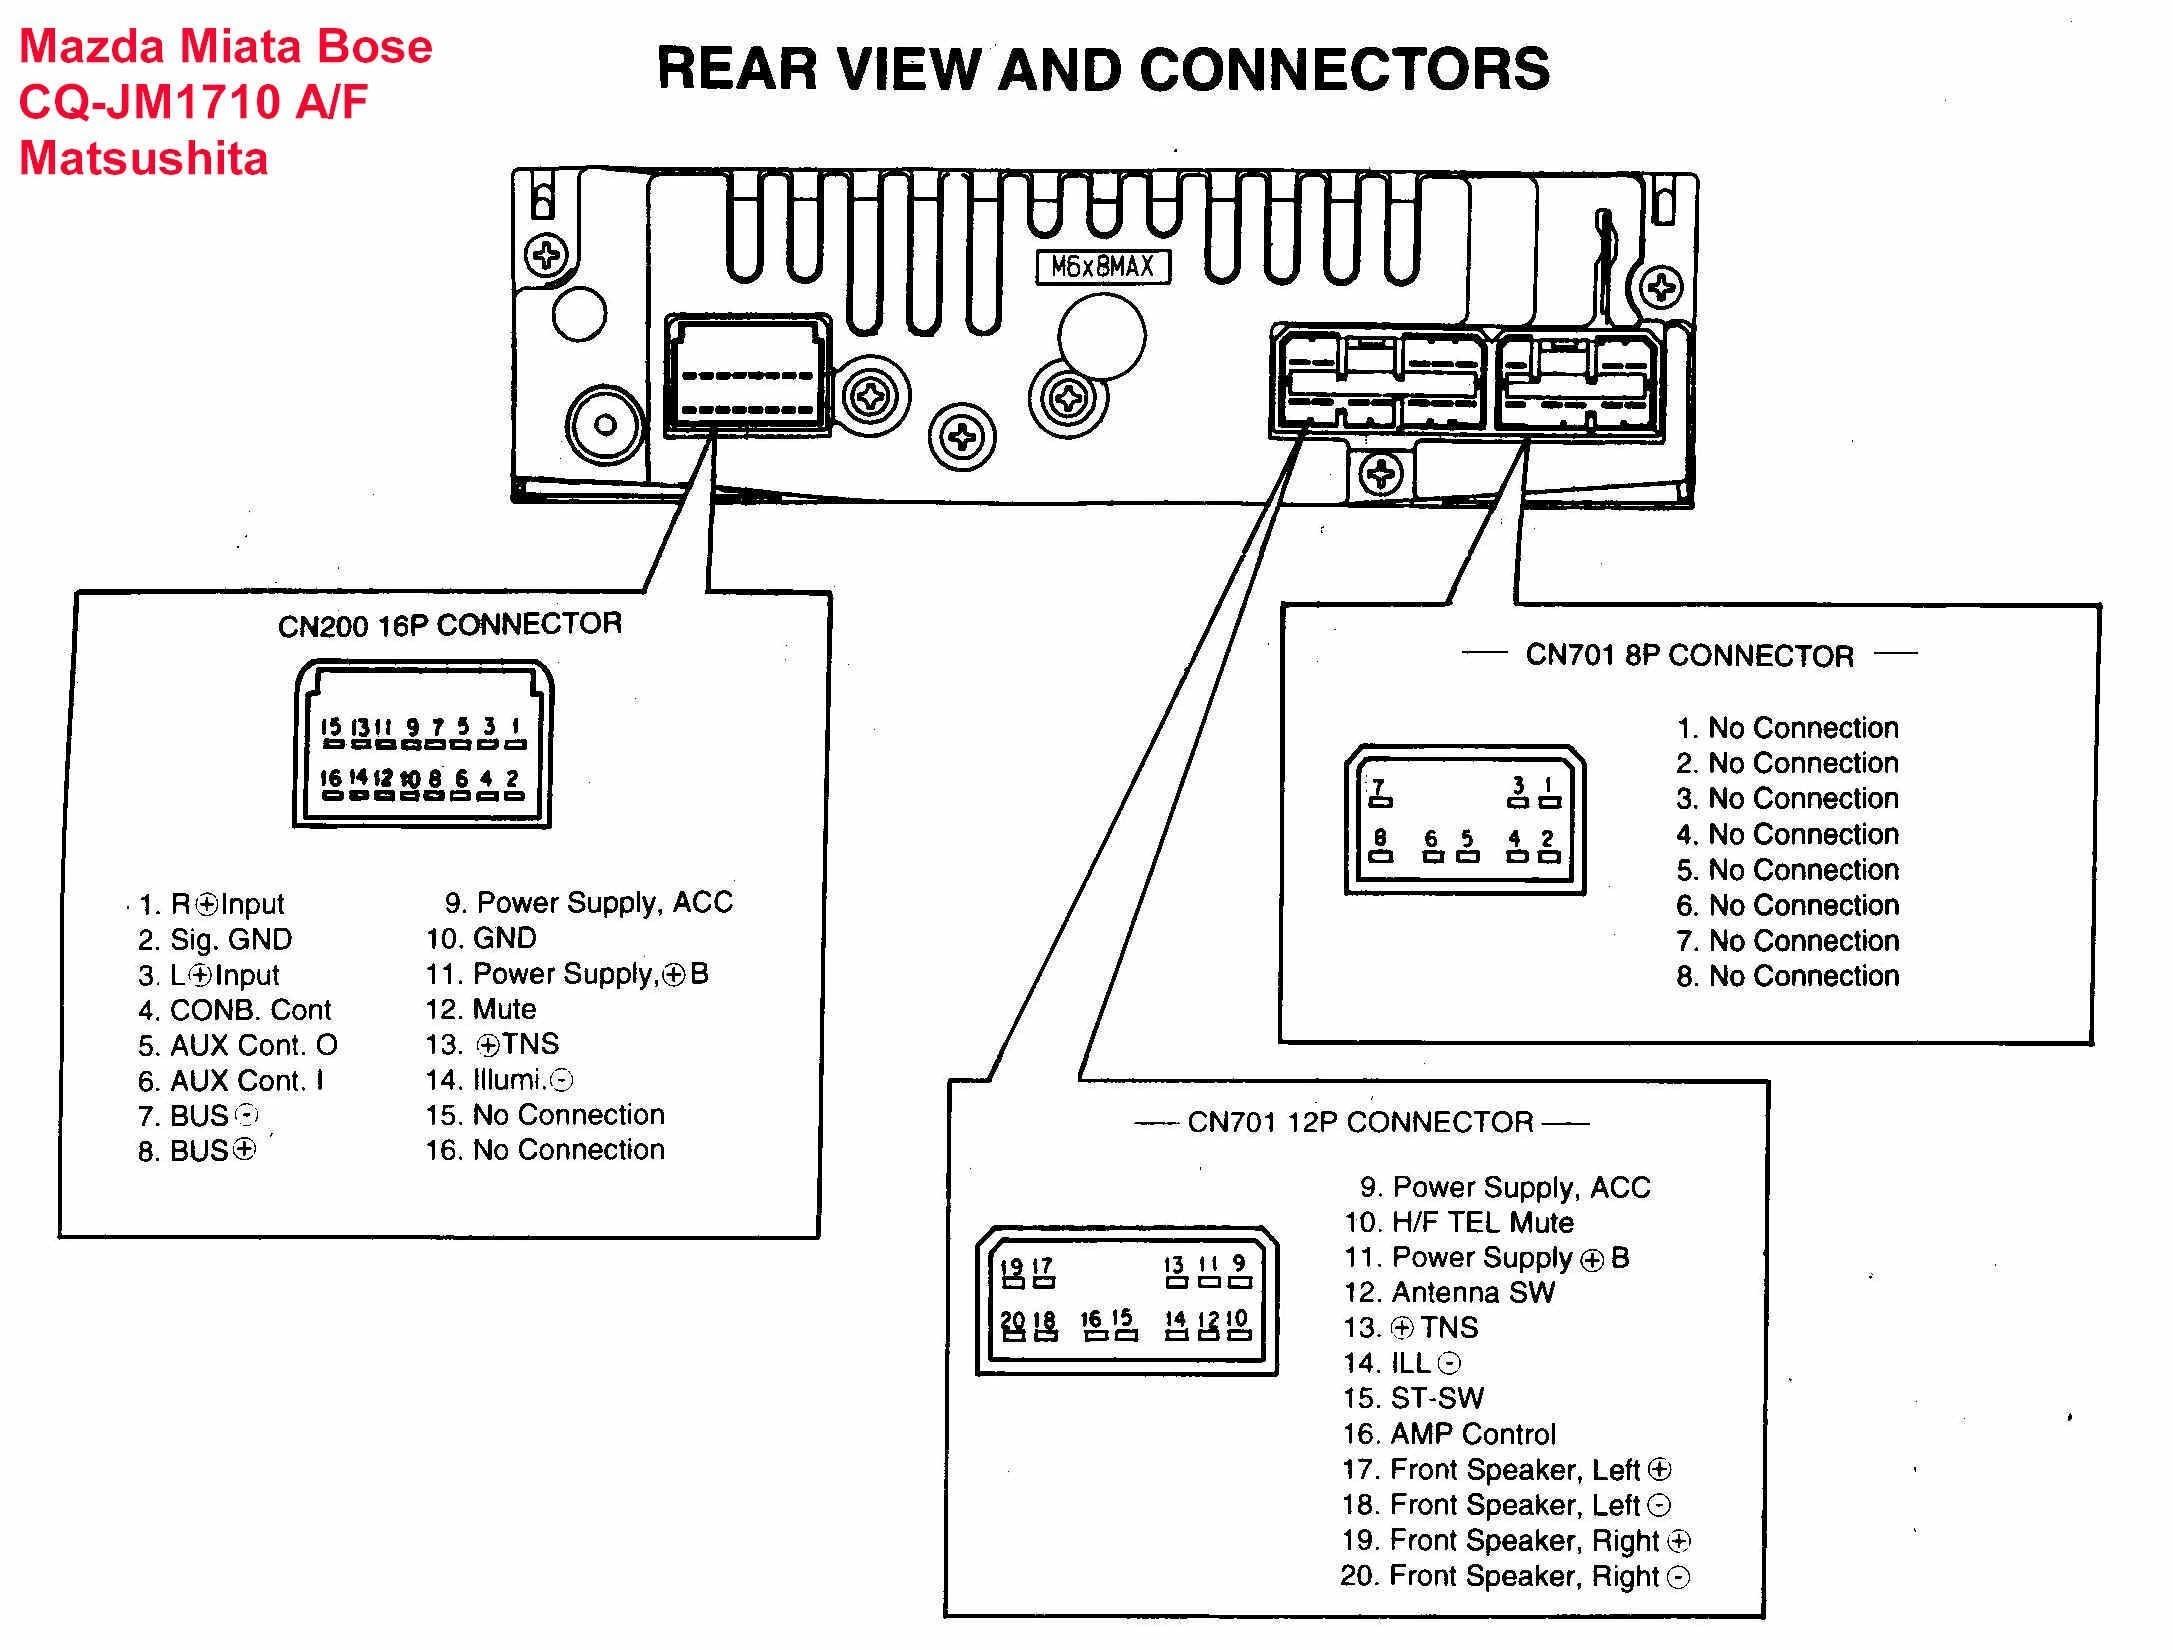 Jvc Car Stereo Wiring Diagram Color Dual Car Radio Wiring Diagram Wiring Schematics Diagram Of Jvc Car Stereo Wiring Diagram Color